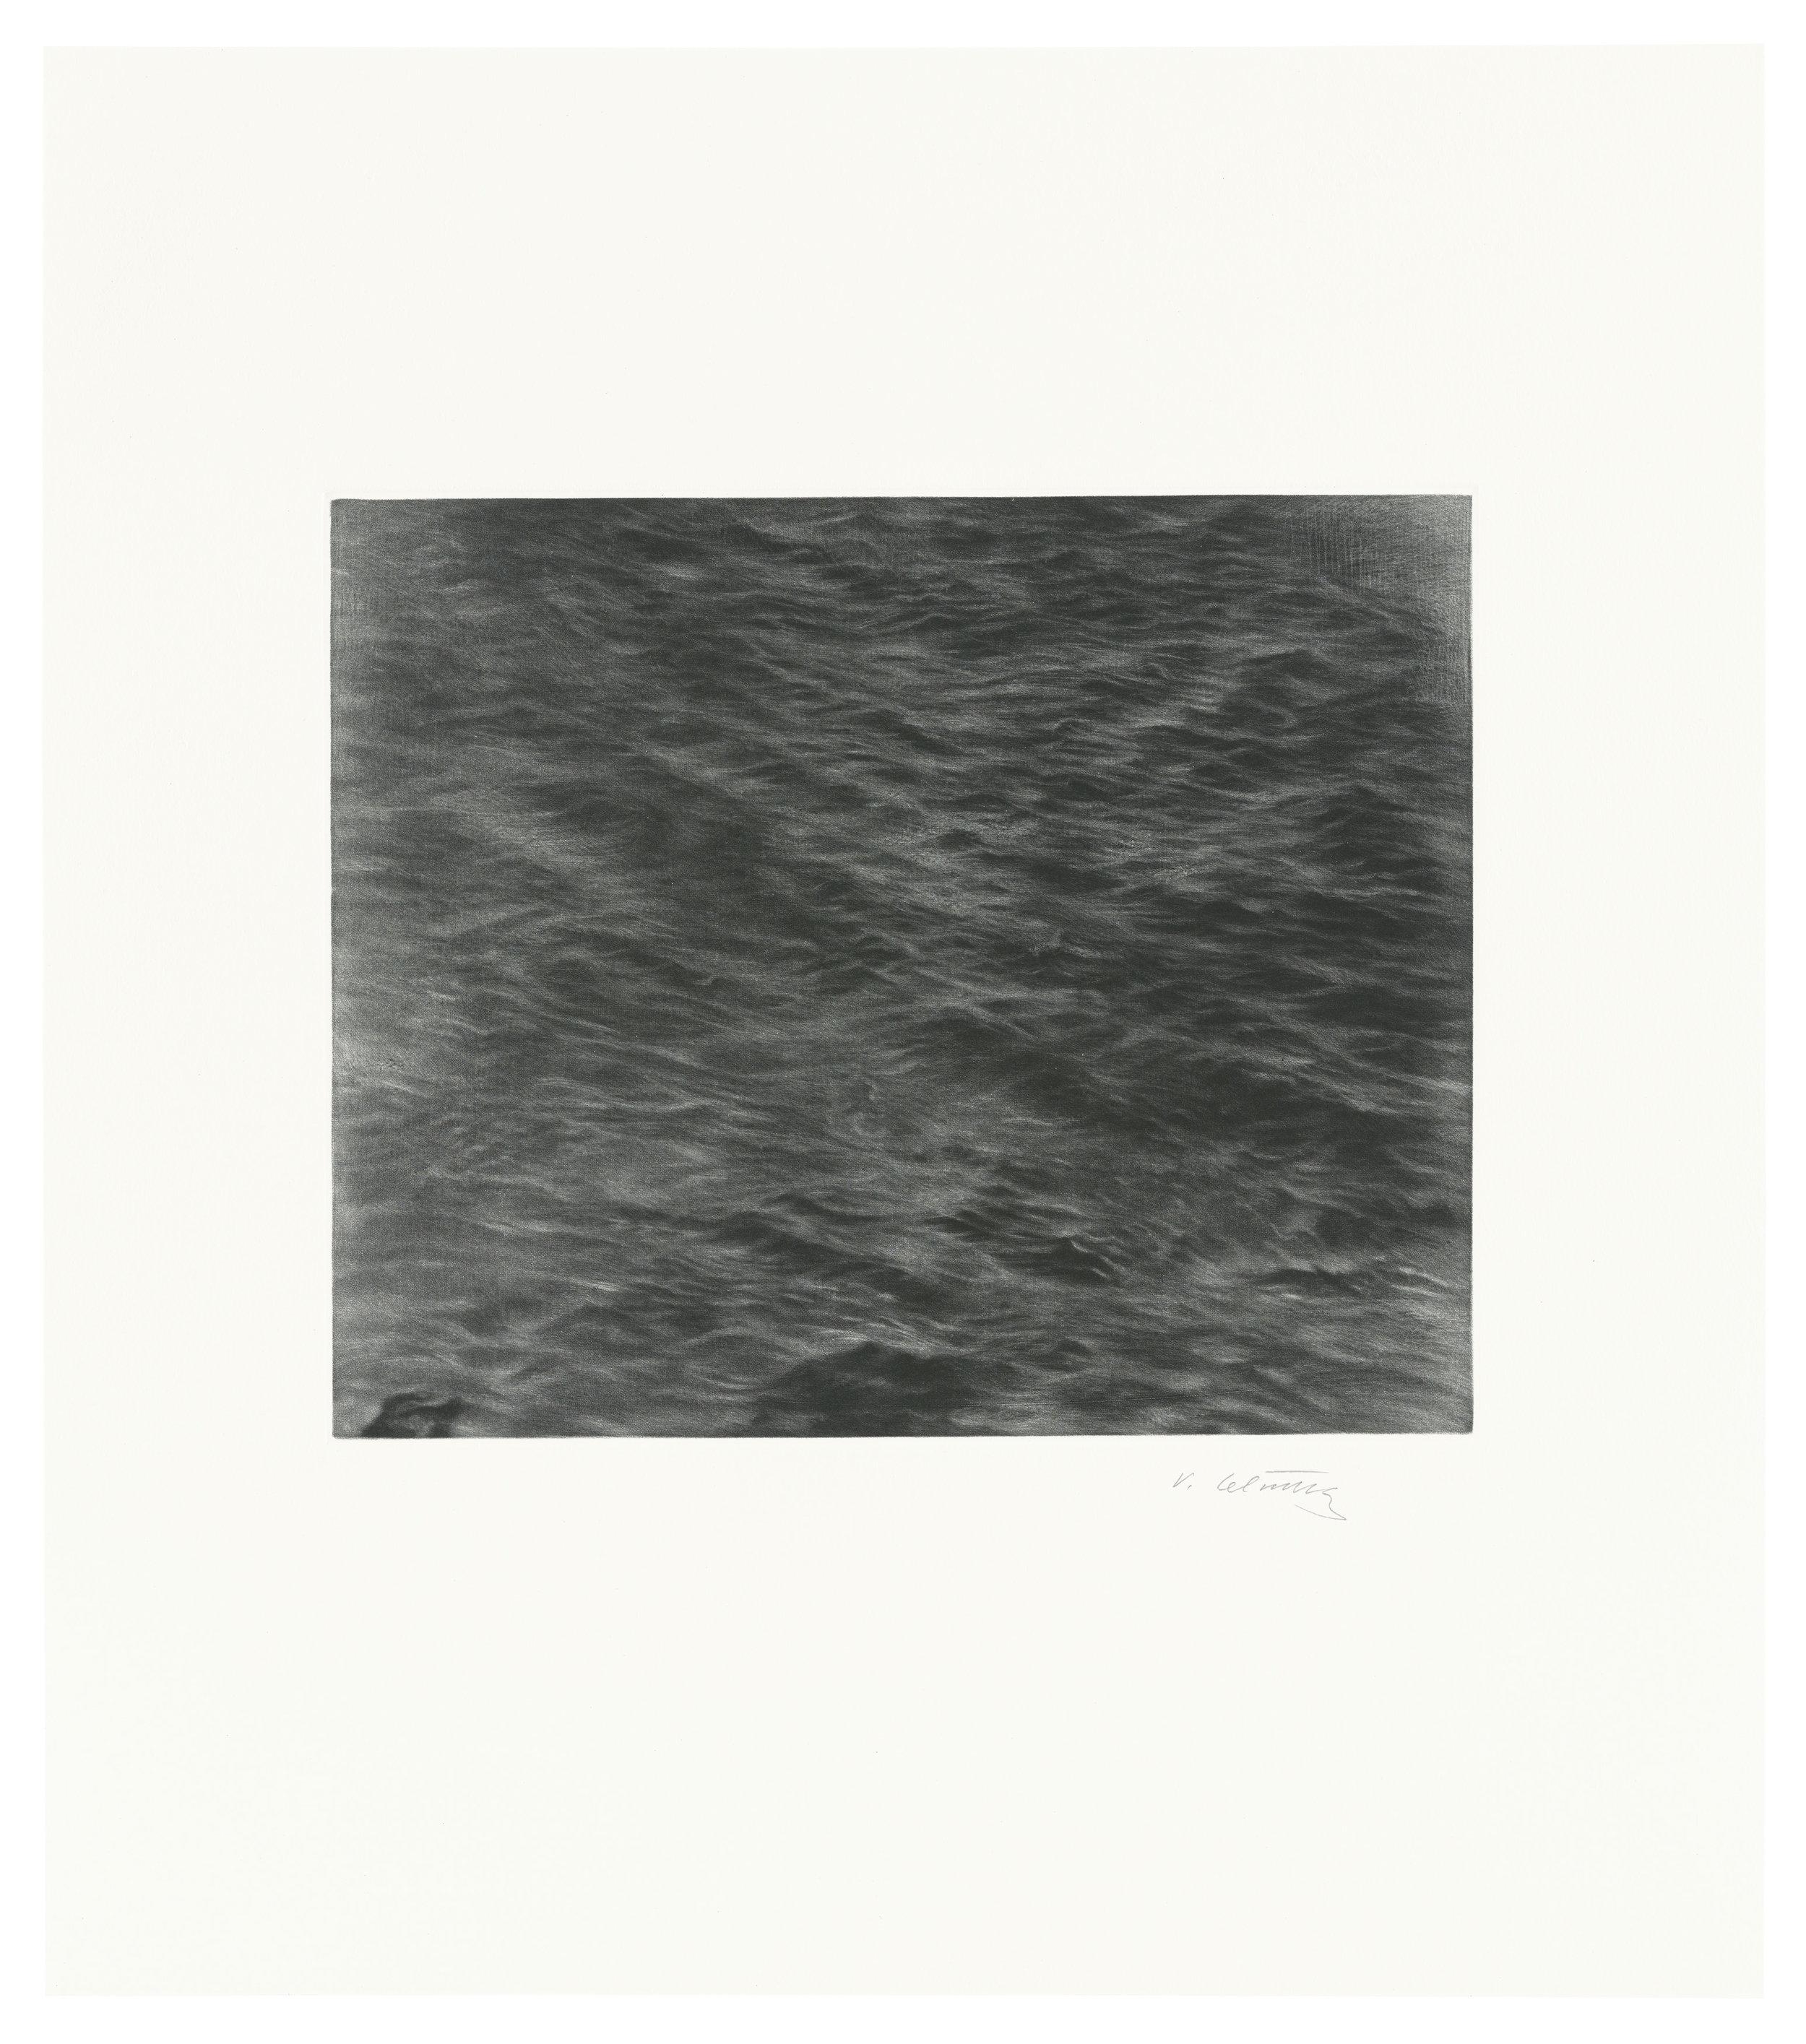 Untitled (Ocean Mezzotint)